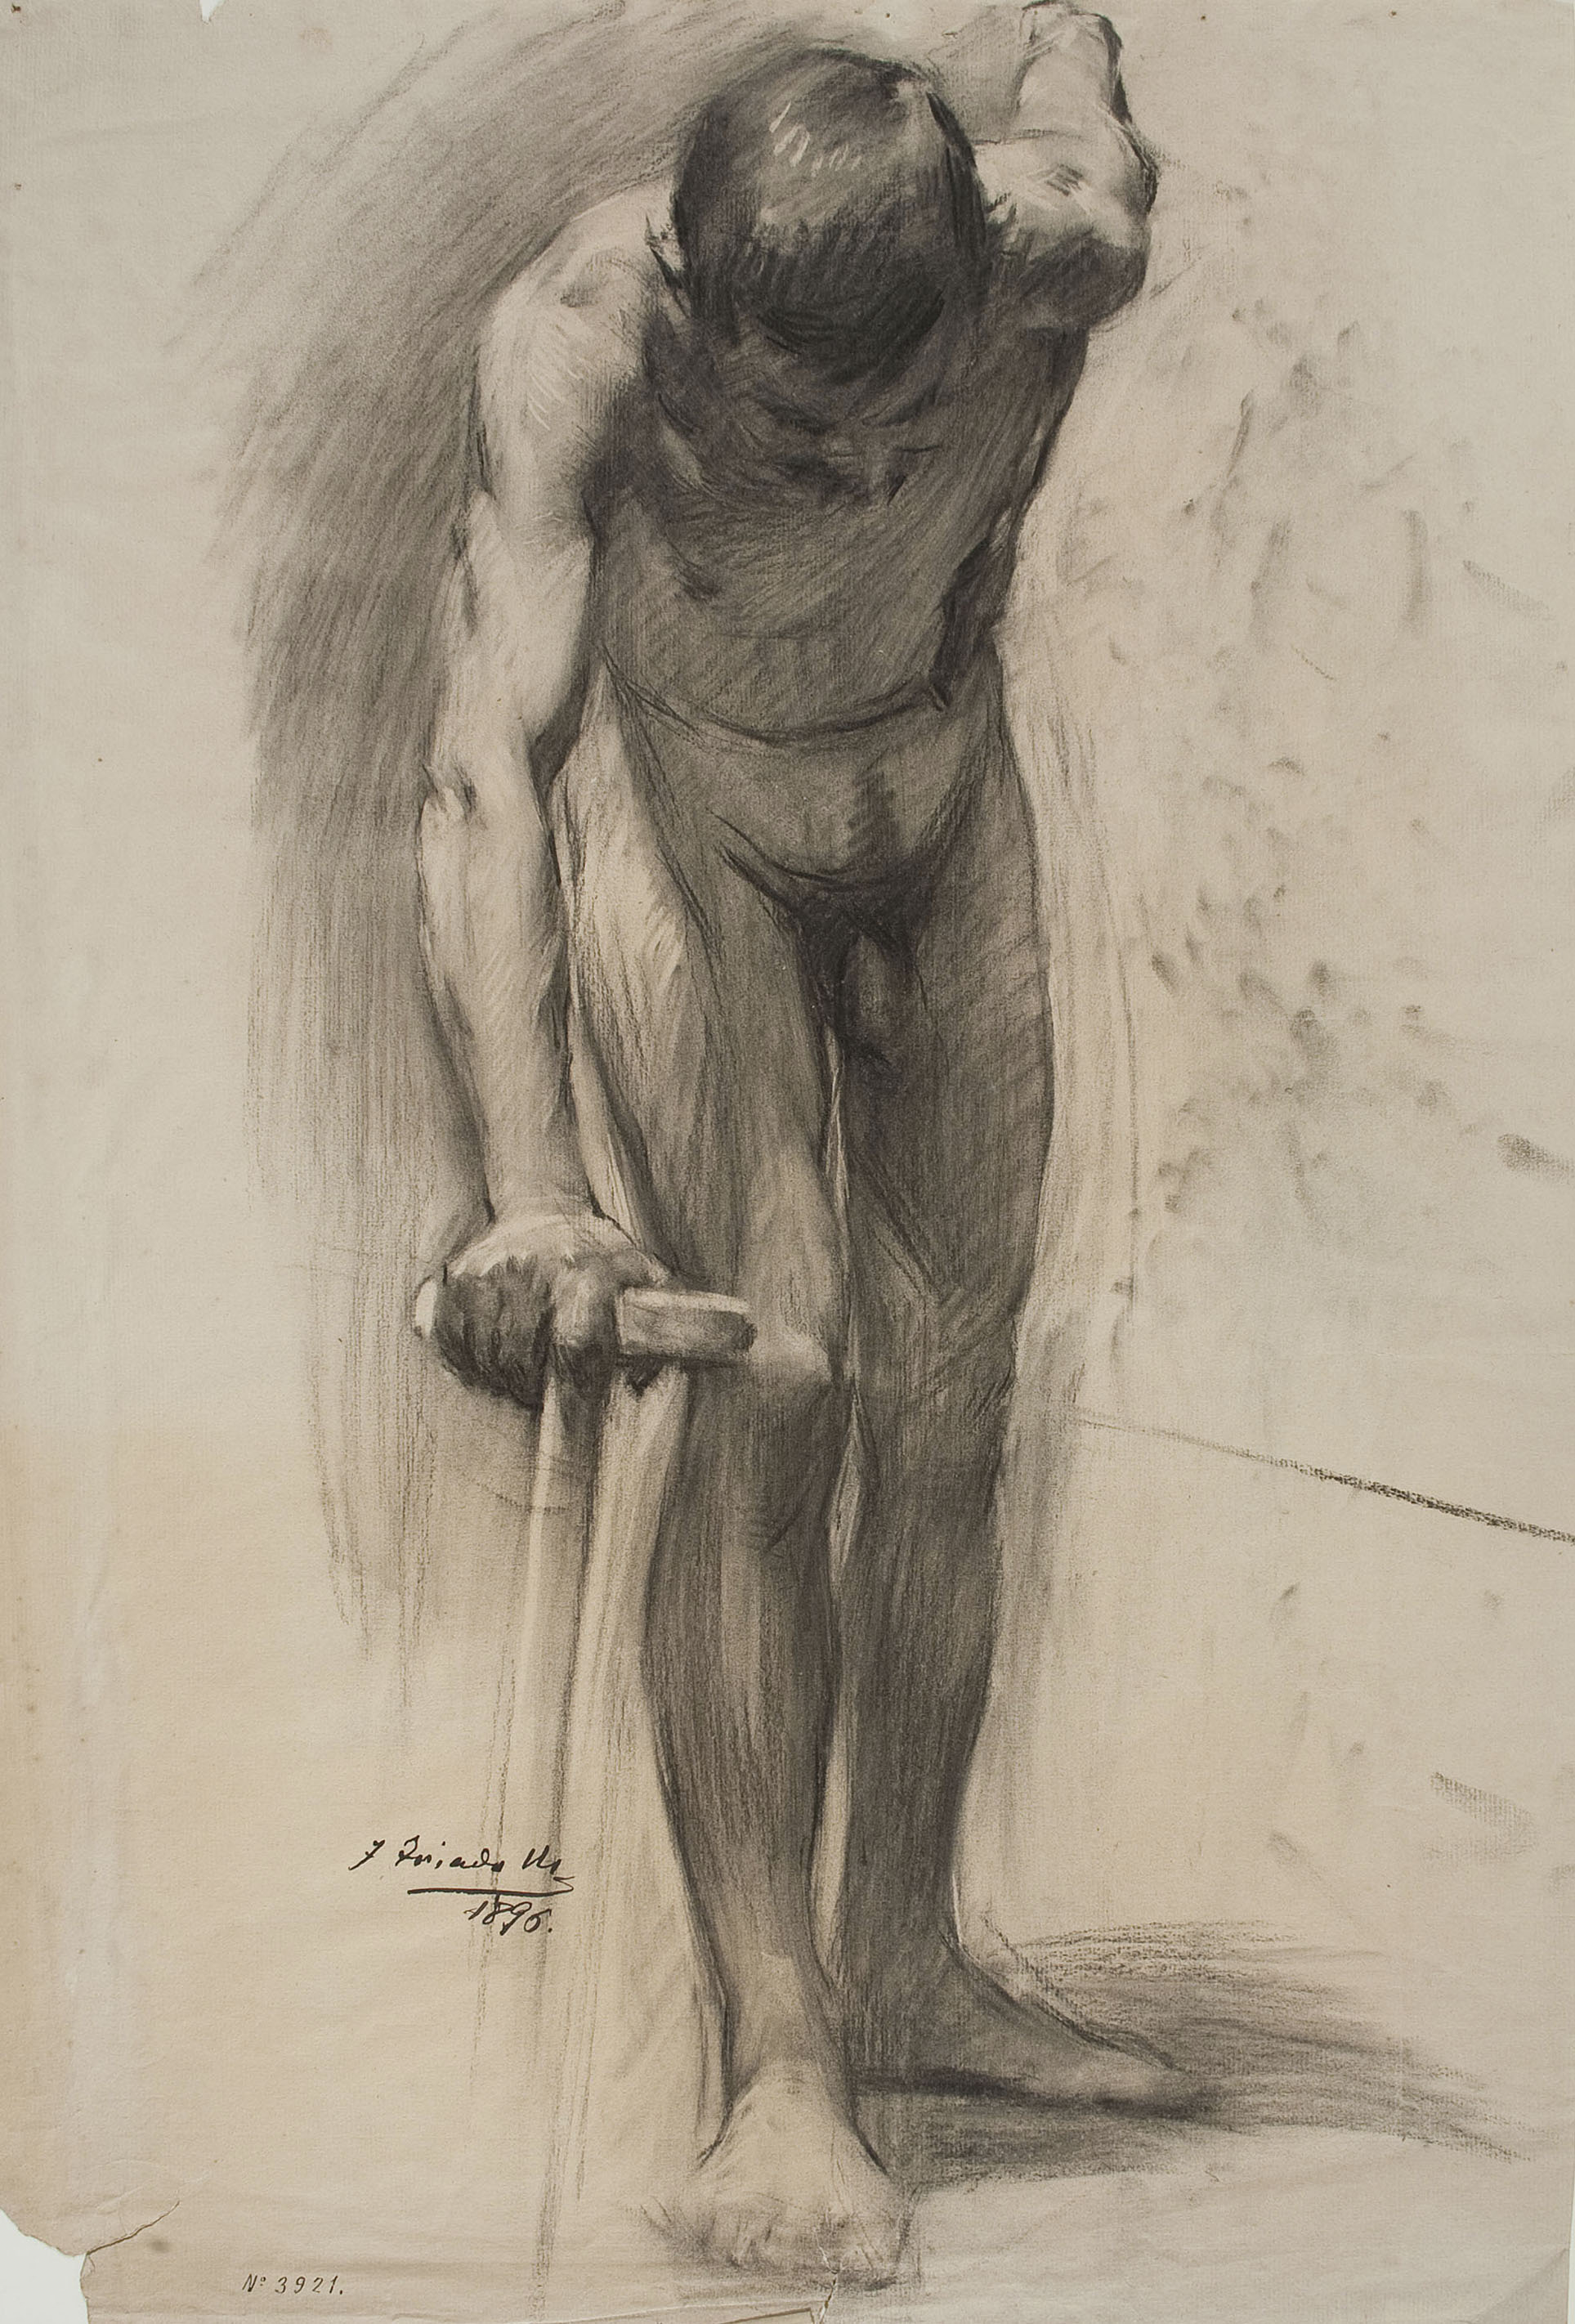 Josep Triadó - Nu masculí (anvers) / Nu femení d'esquena (revers) - 1896